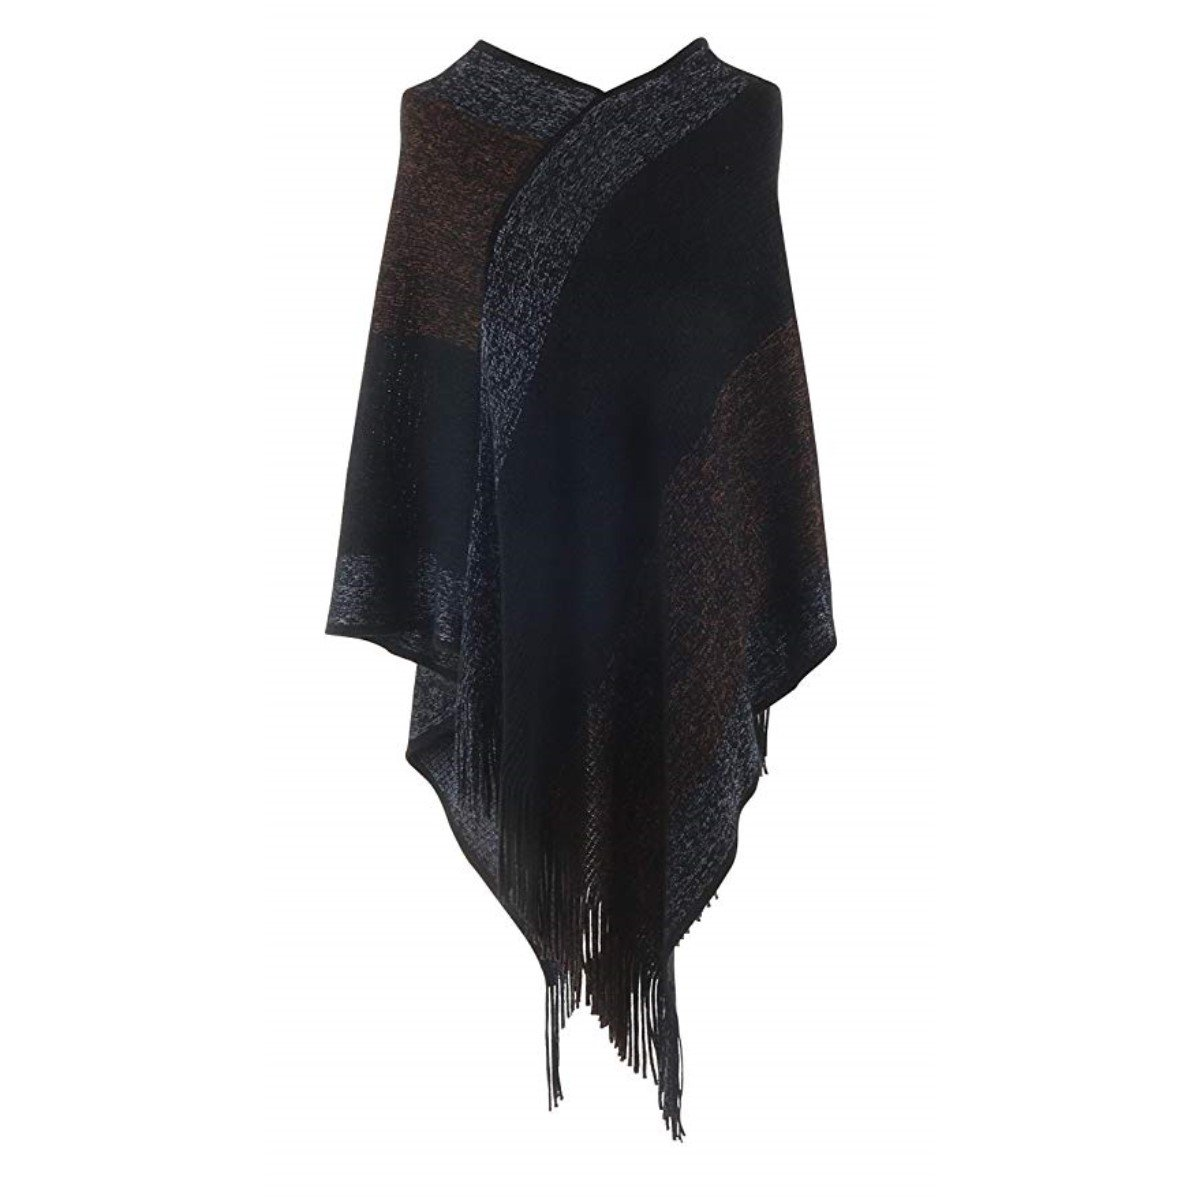 Marled Knit Poncho